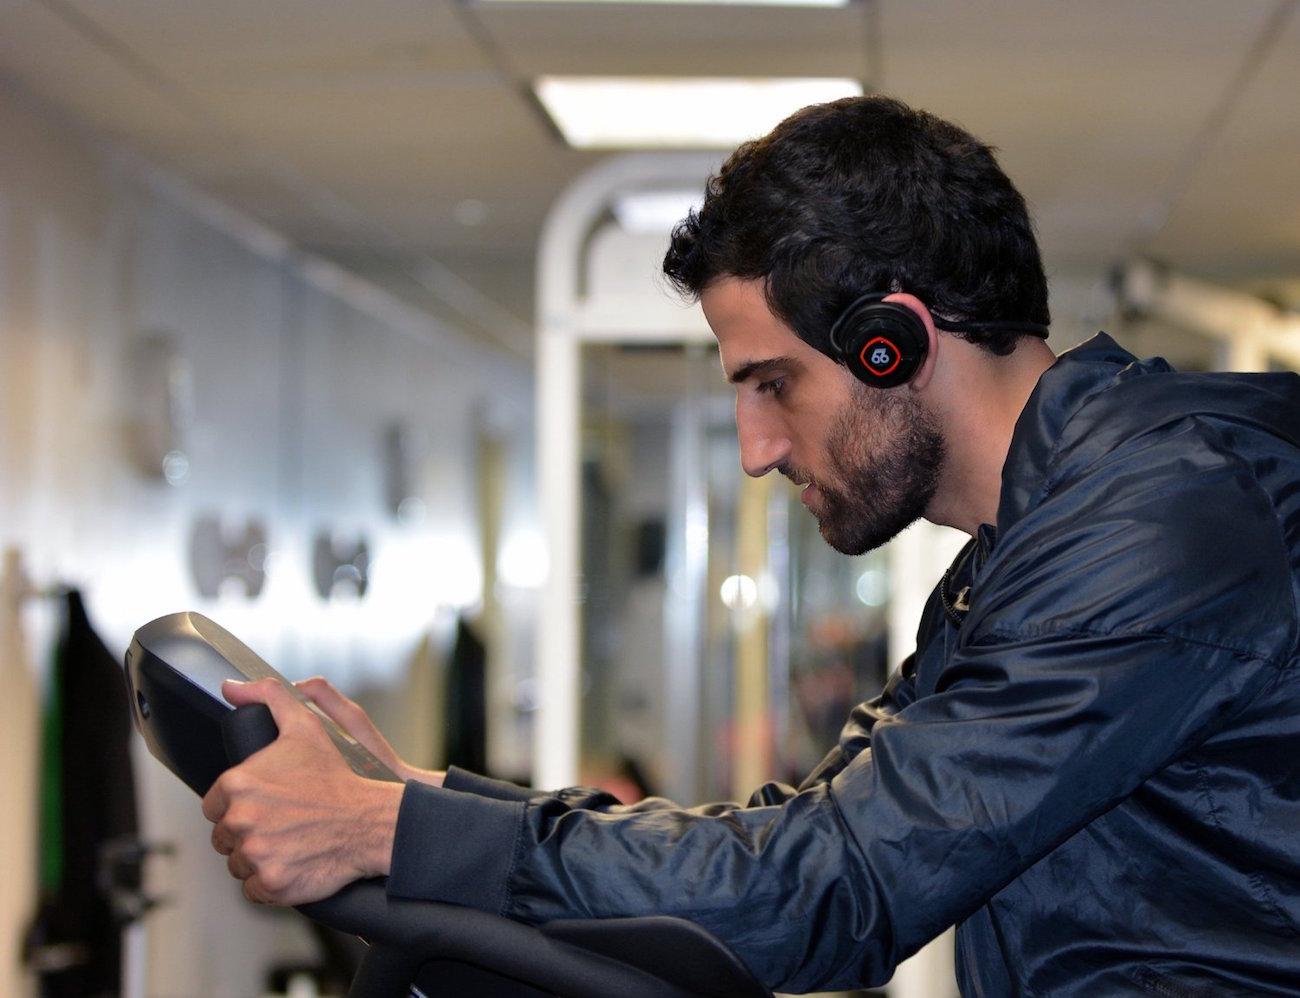 66-audio-bts-sport-bluetooth-headphones-01